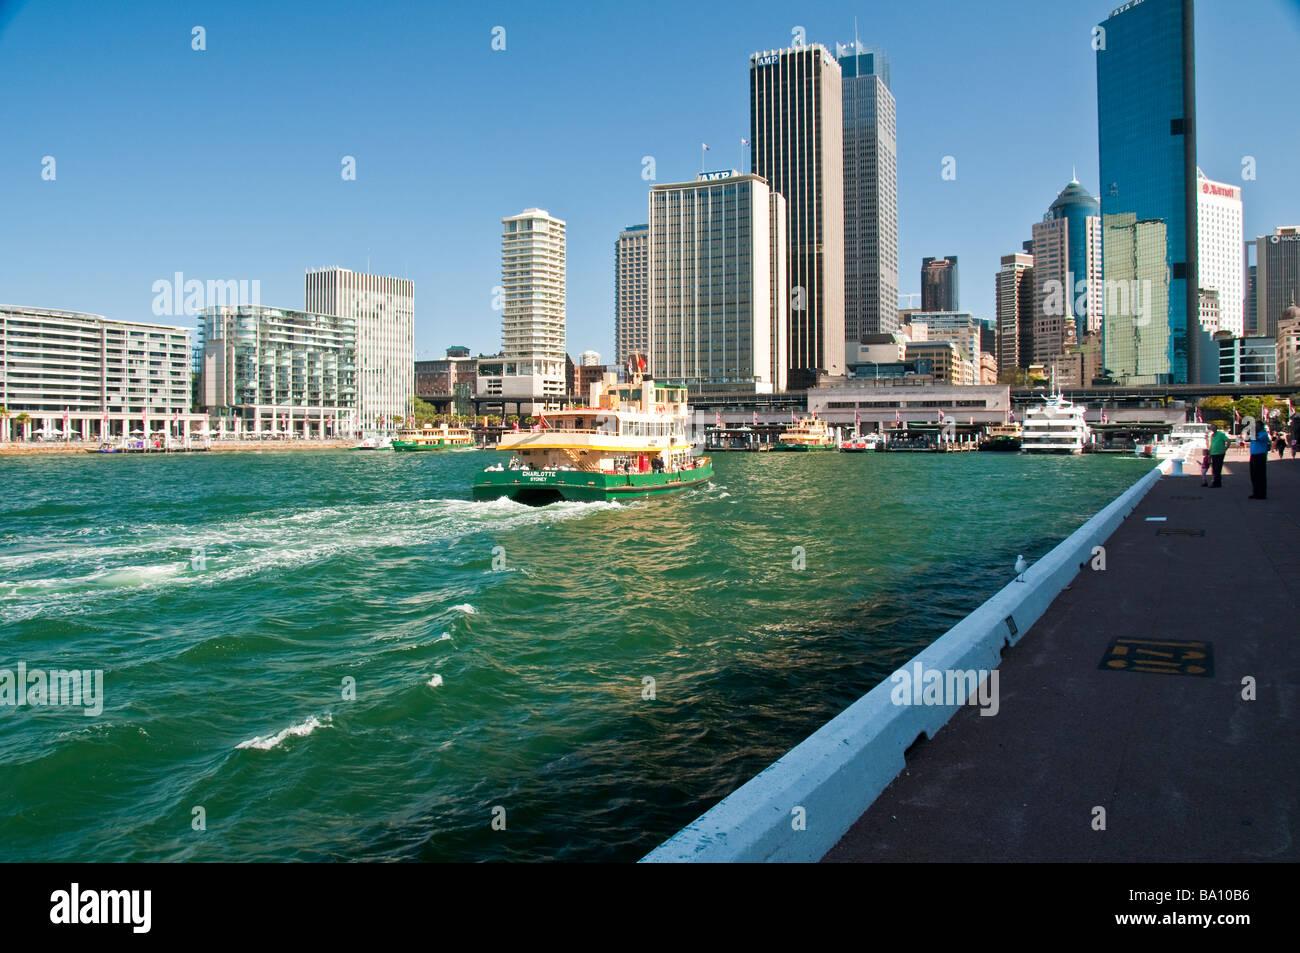 Sydney skyline Circular Quay Australia - Stock Image